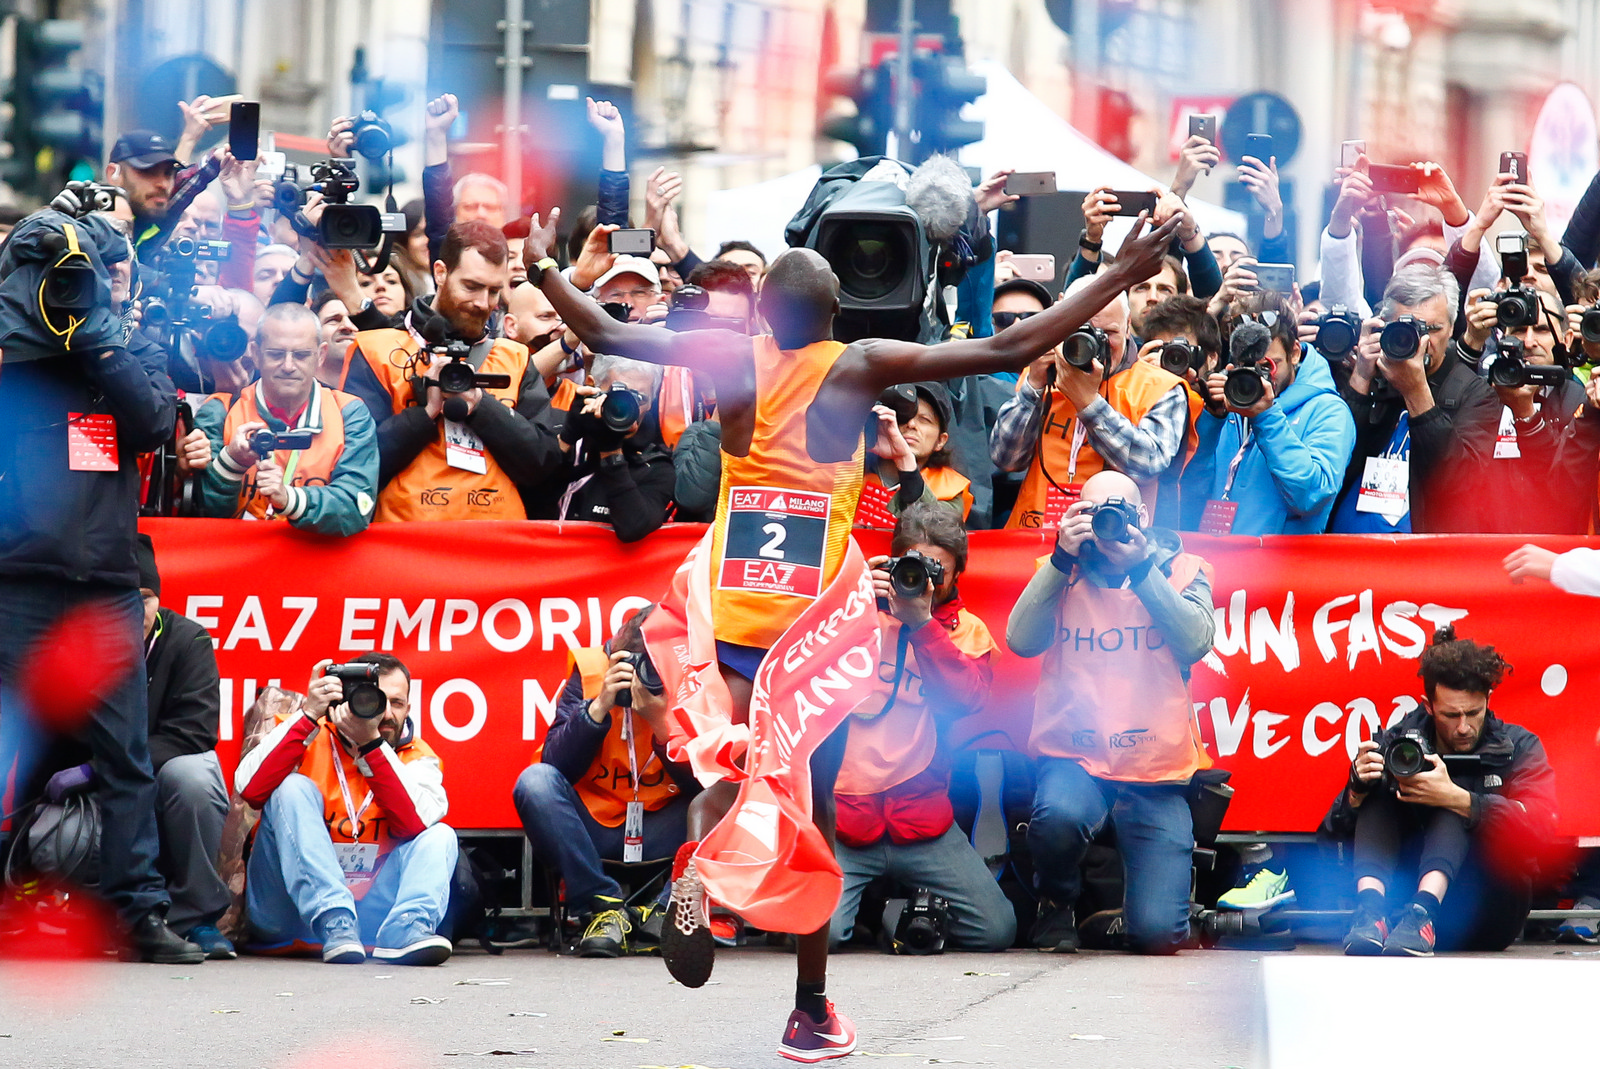 Foto  LaPresse/  Spada  02-04-2017, Milano sport Milano Marathon EA7 Emporio Armani nella foto:  Edwin Koech vincitore della maratona Photo LaPresse/ Spada 2017-04-02, Milan Milano Marathon EA7 Emporio Armani In the picture: Edwin Koech